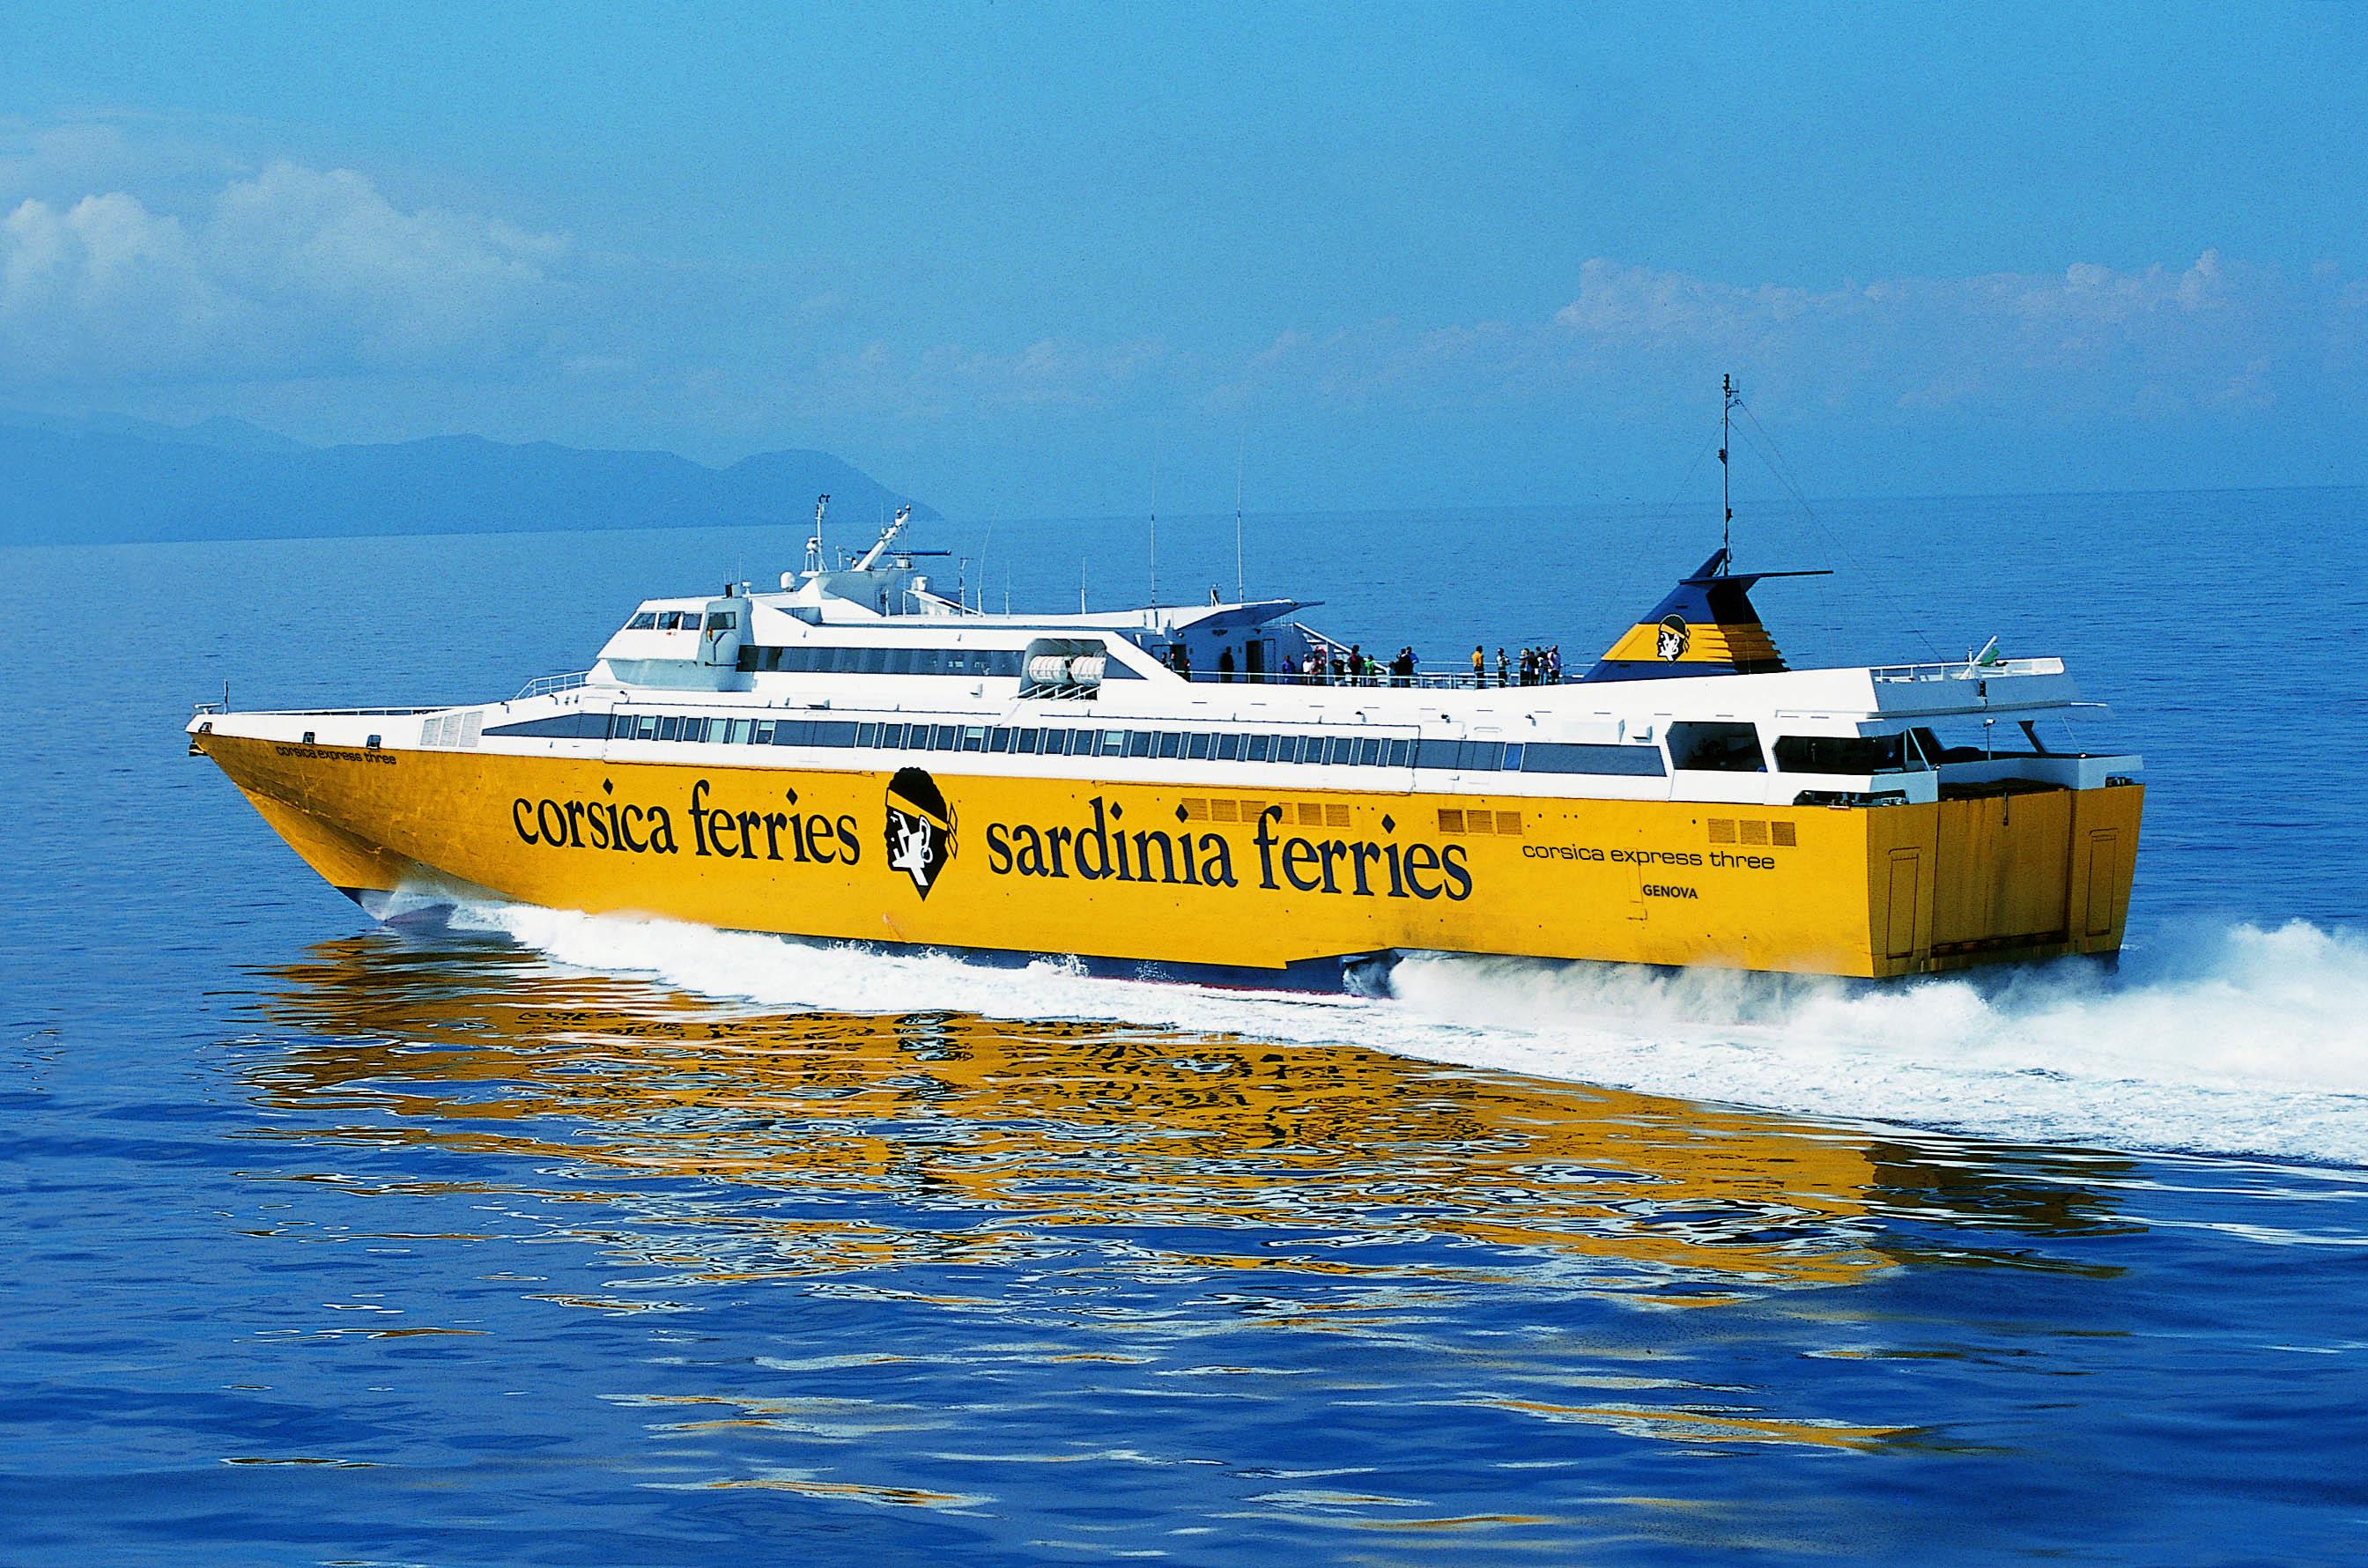 Corsica Express Three